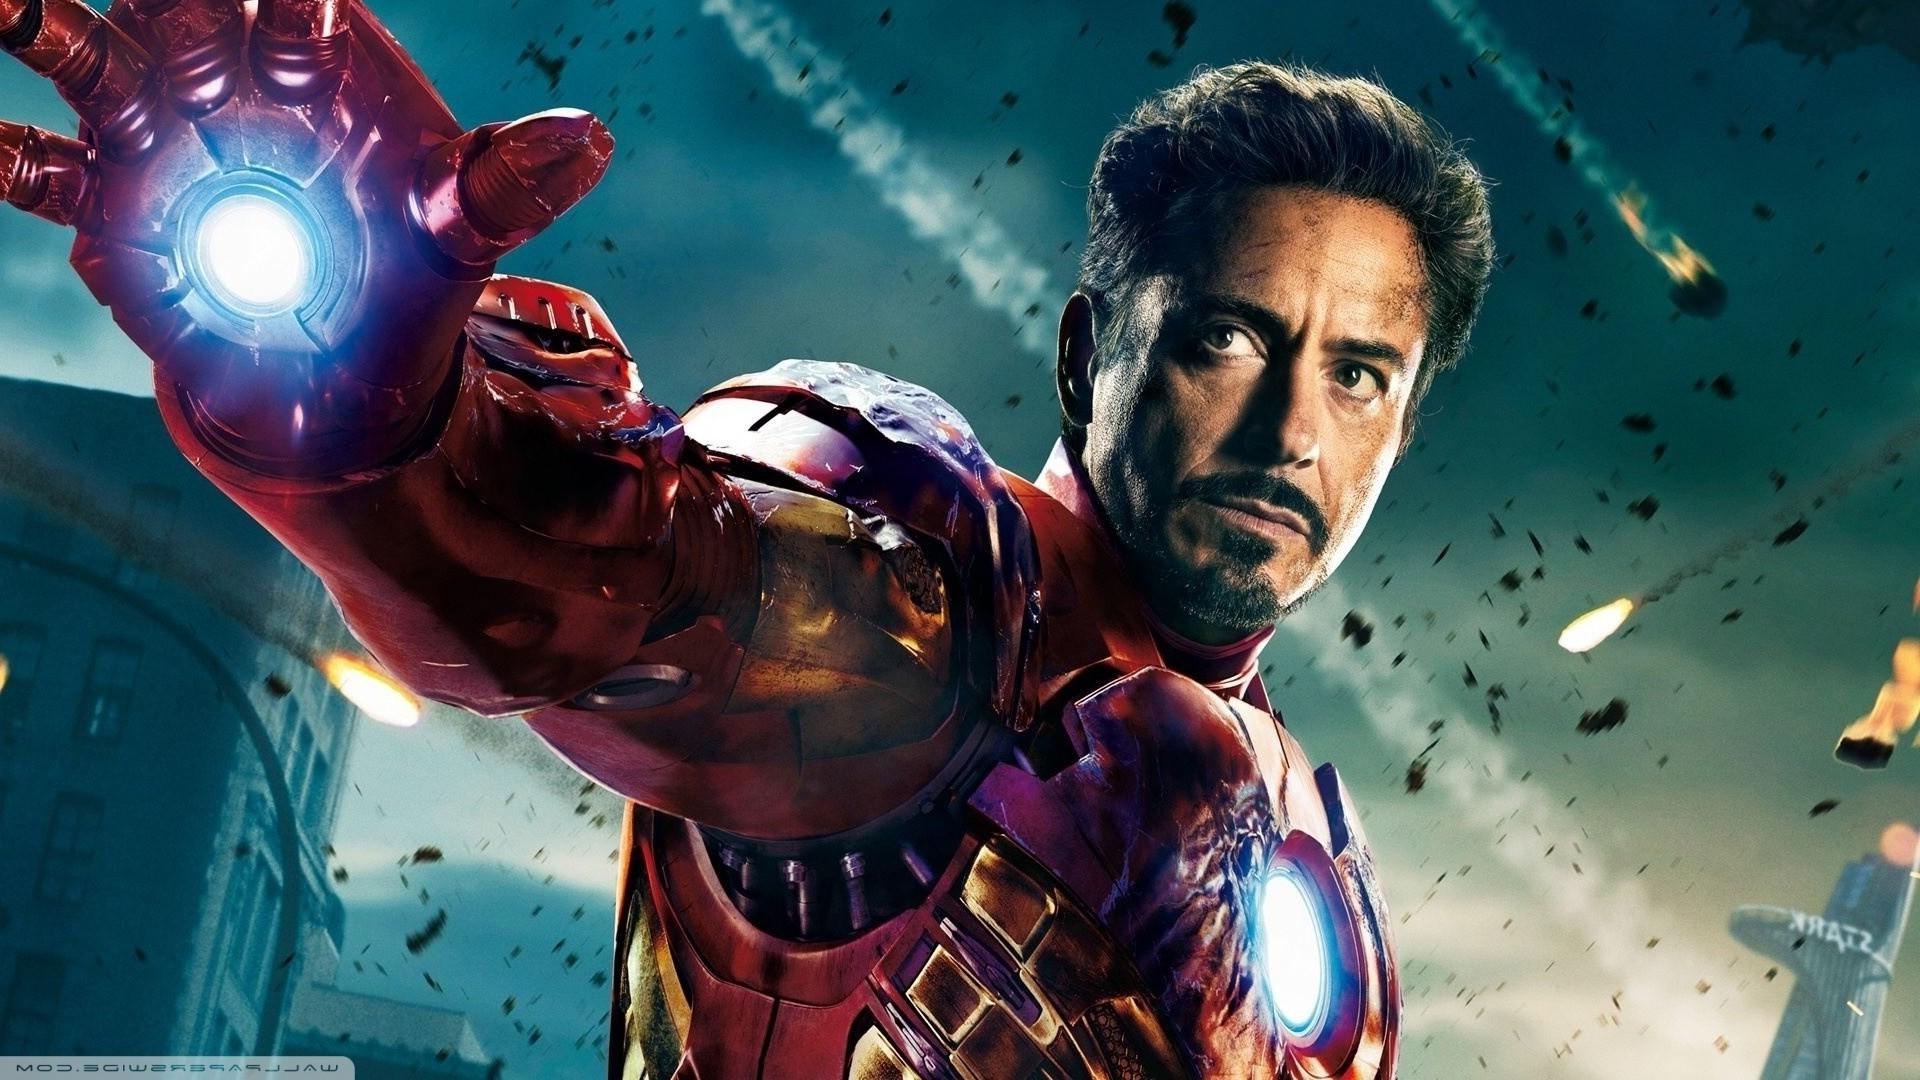 Wallpaper Movies Superhero Iron Man The Avengers Robert Downey